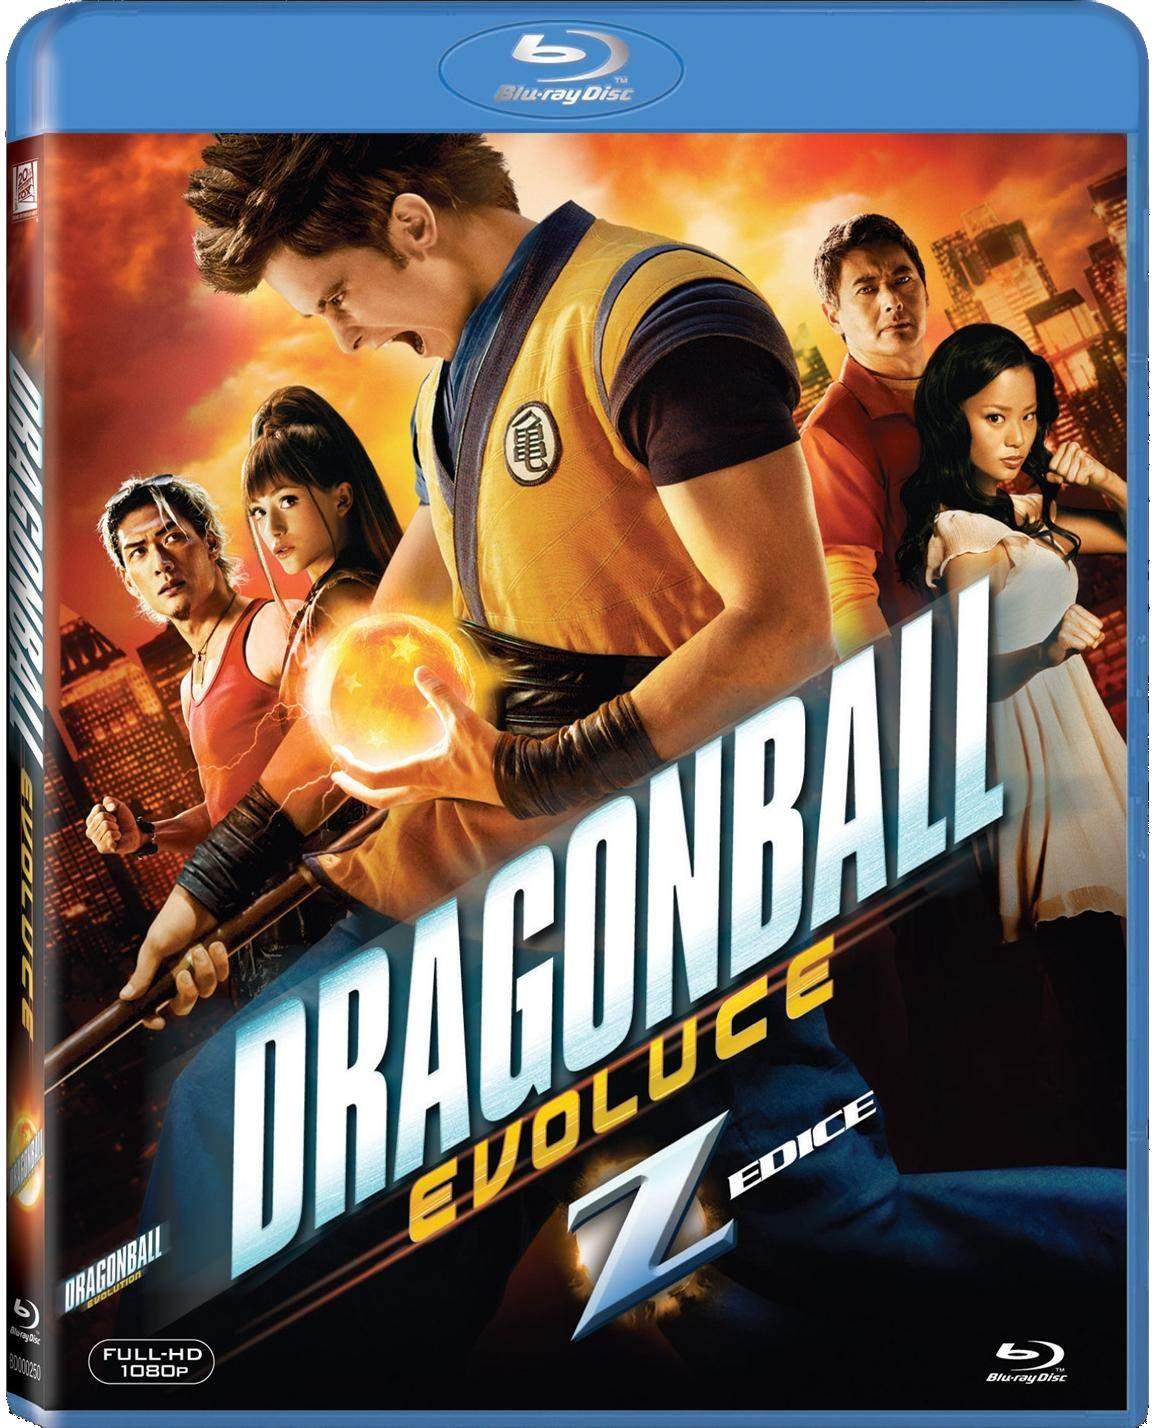 DRAGONBALL: EVOLUCE - Blu-ray